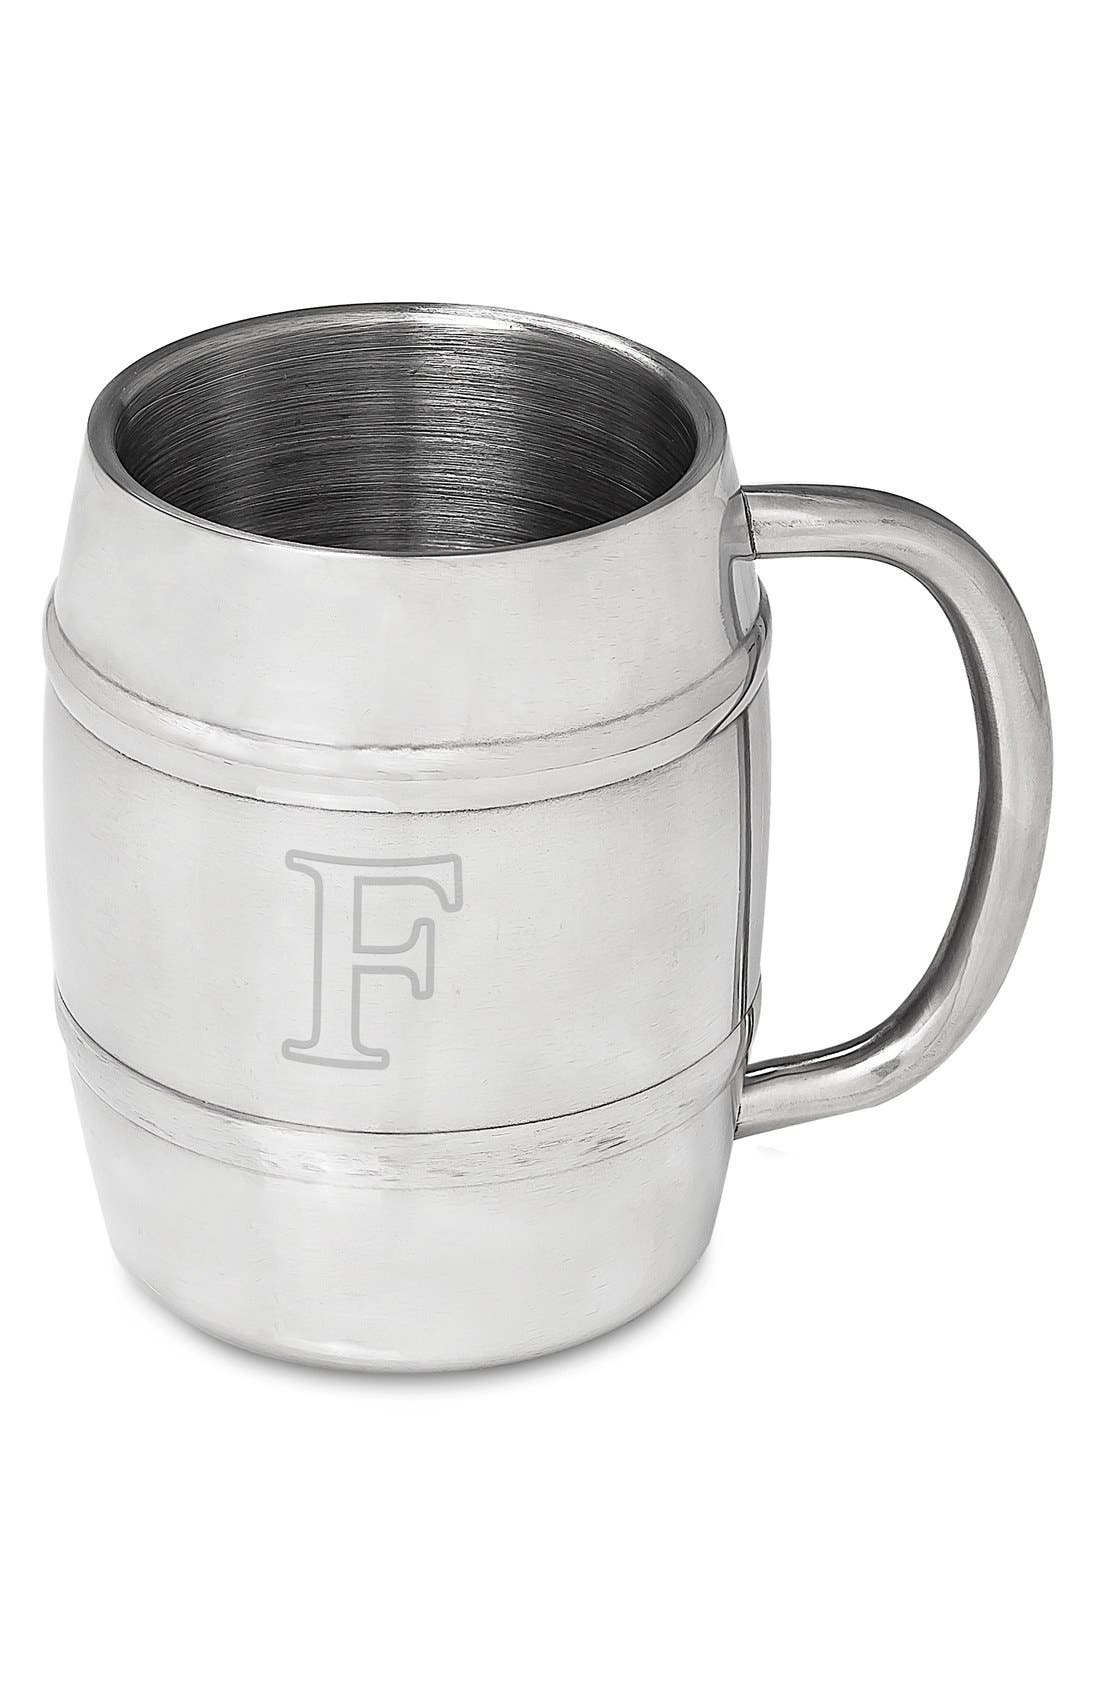 Monogram Stainless Steel Keg Mug,                             Main thumbnail 8, color,